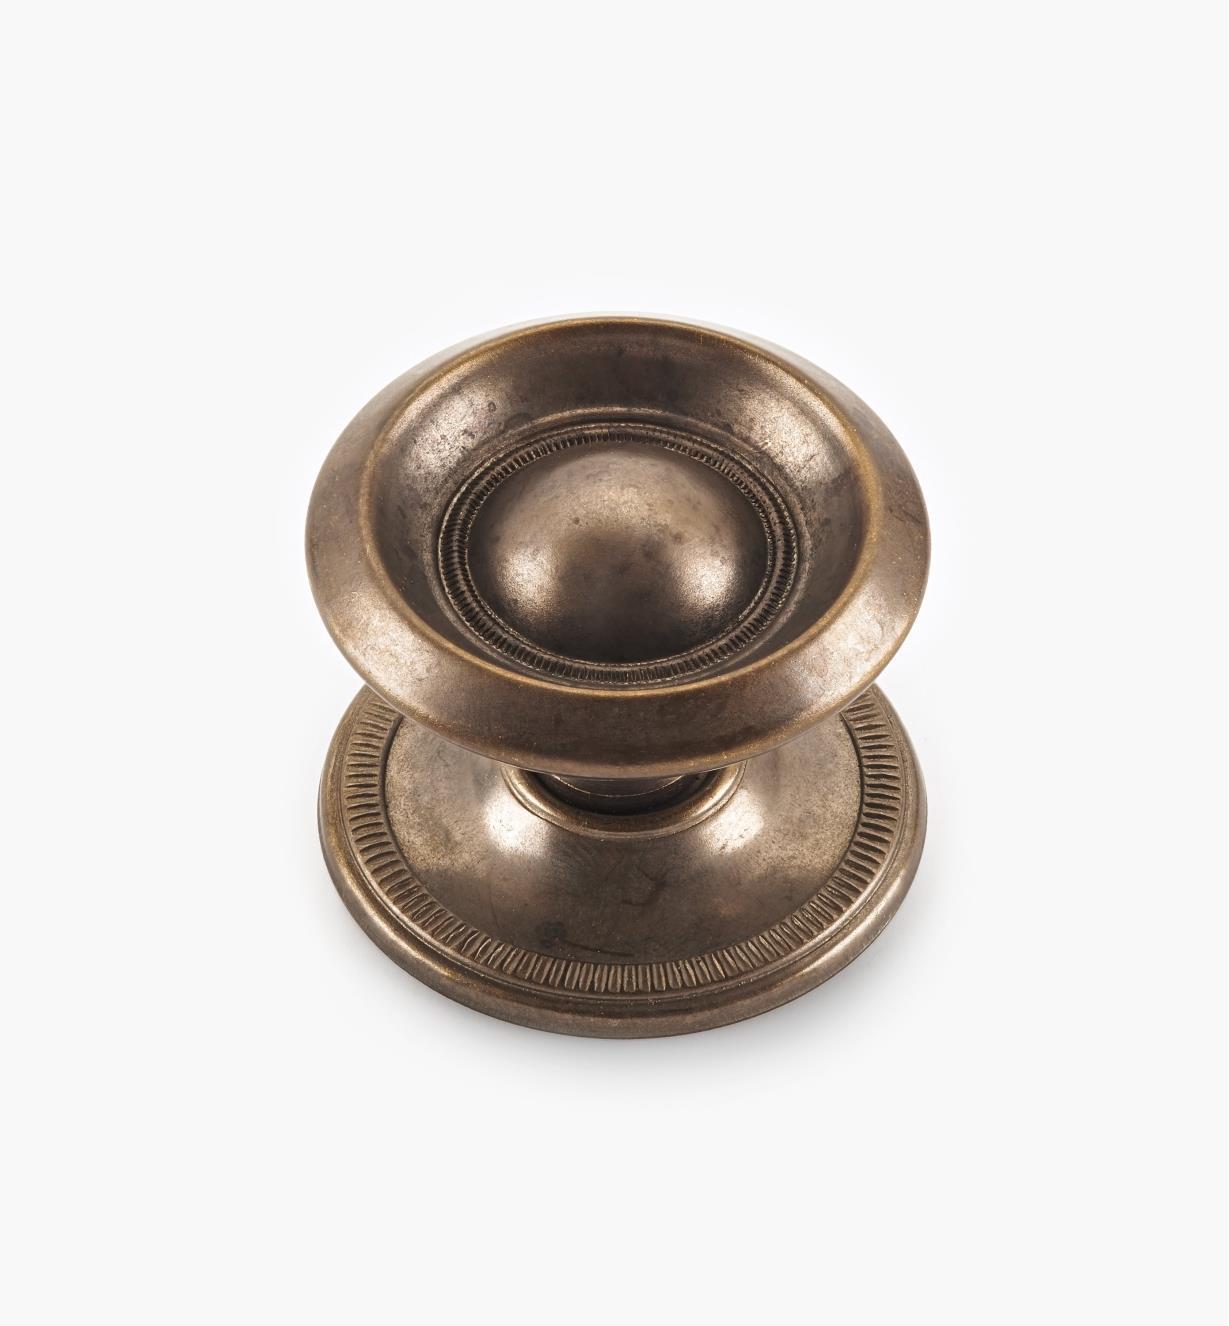 "00A2614 - 1 3/4"" x 1 1/4"" Ring Sheraton Knob"